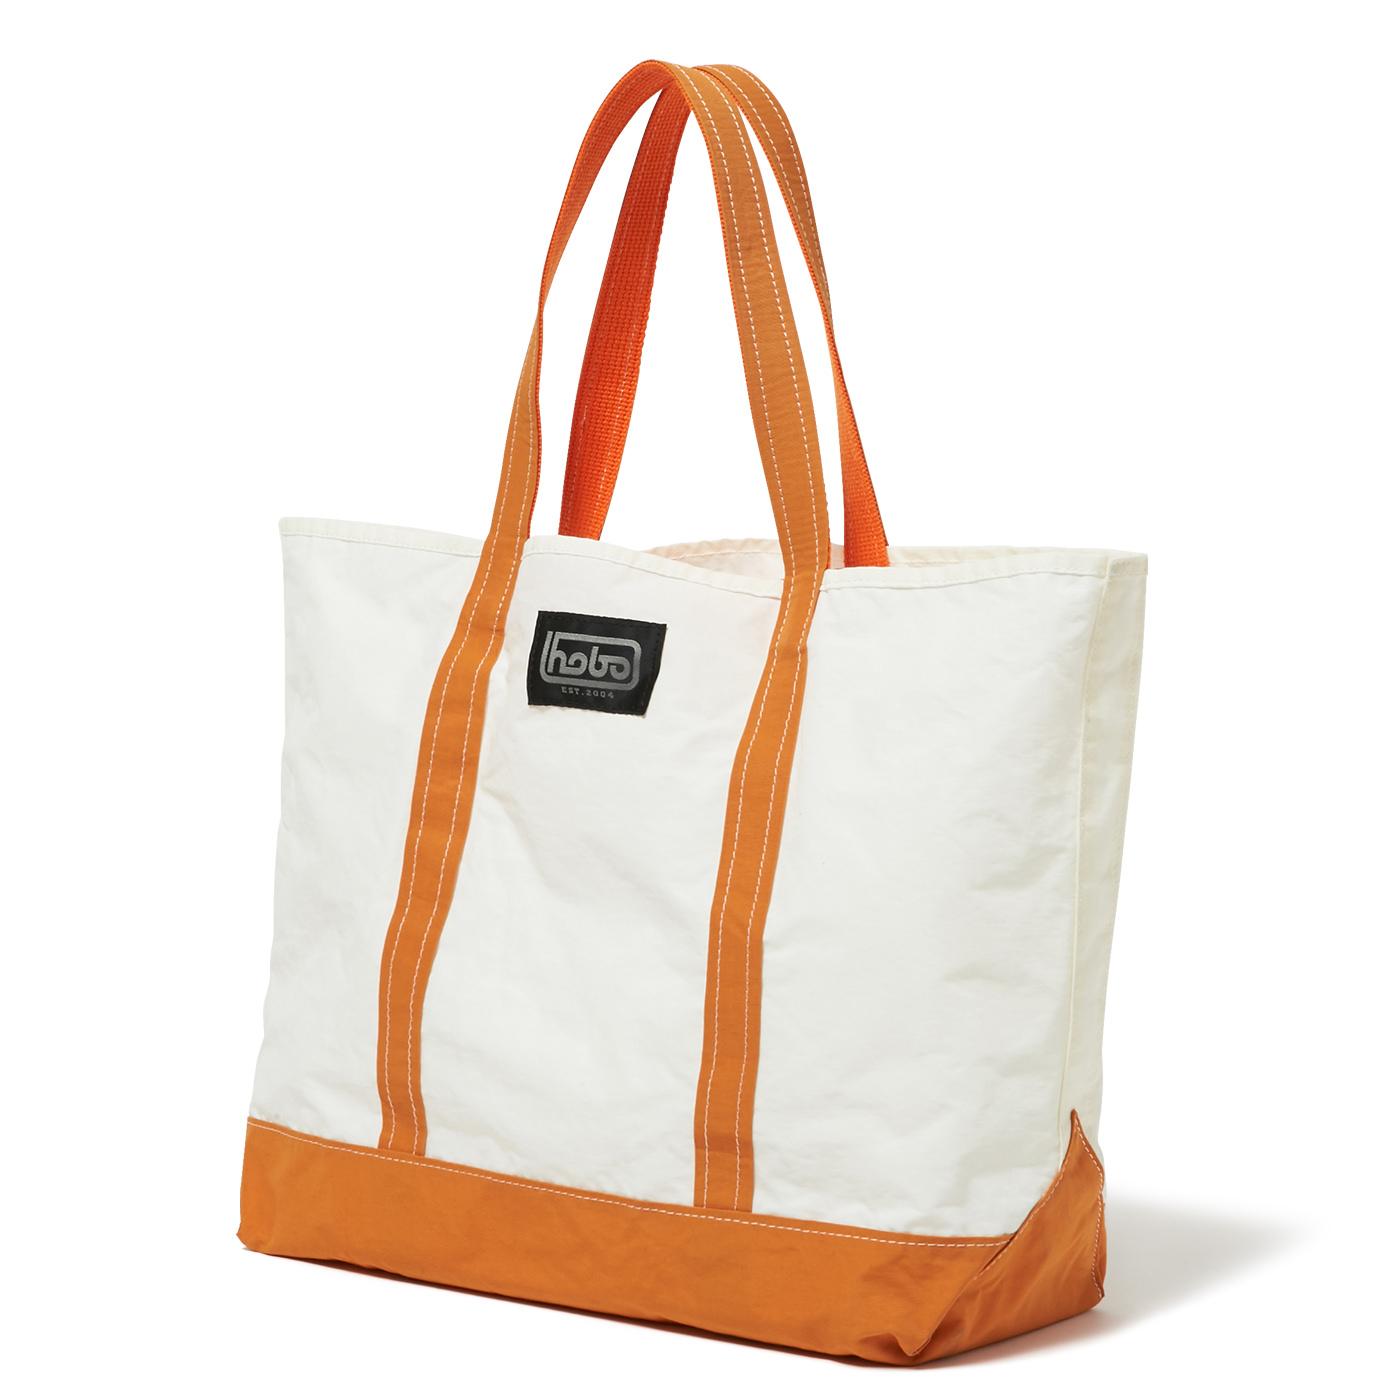 HOBO / Cotton Nylon Grosgrain Tote Bag M -orange